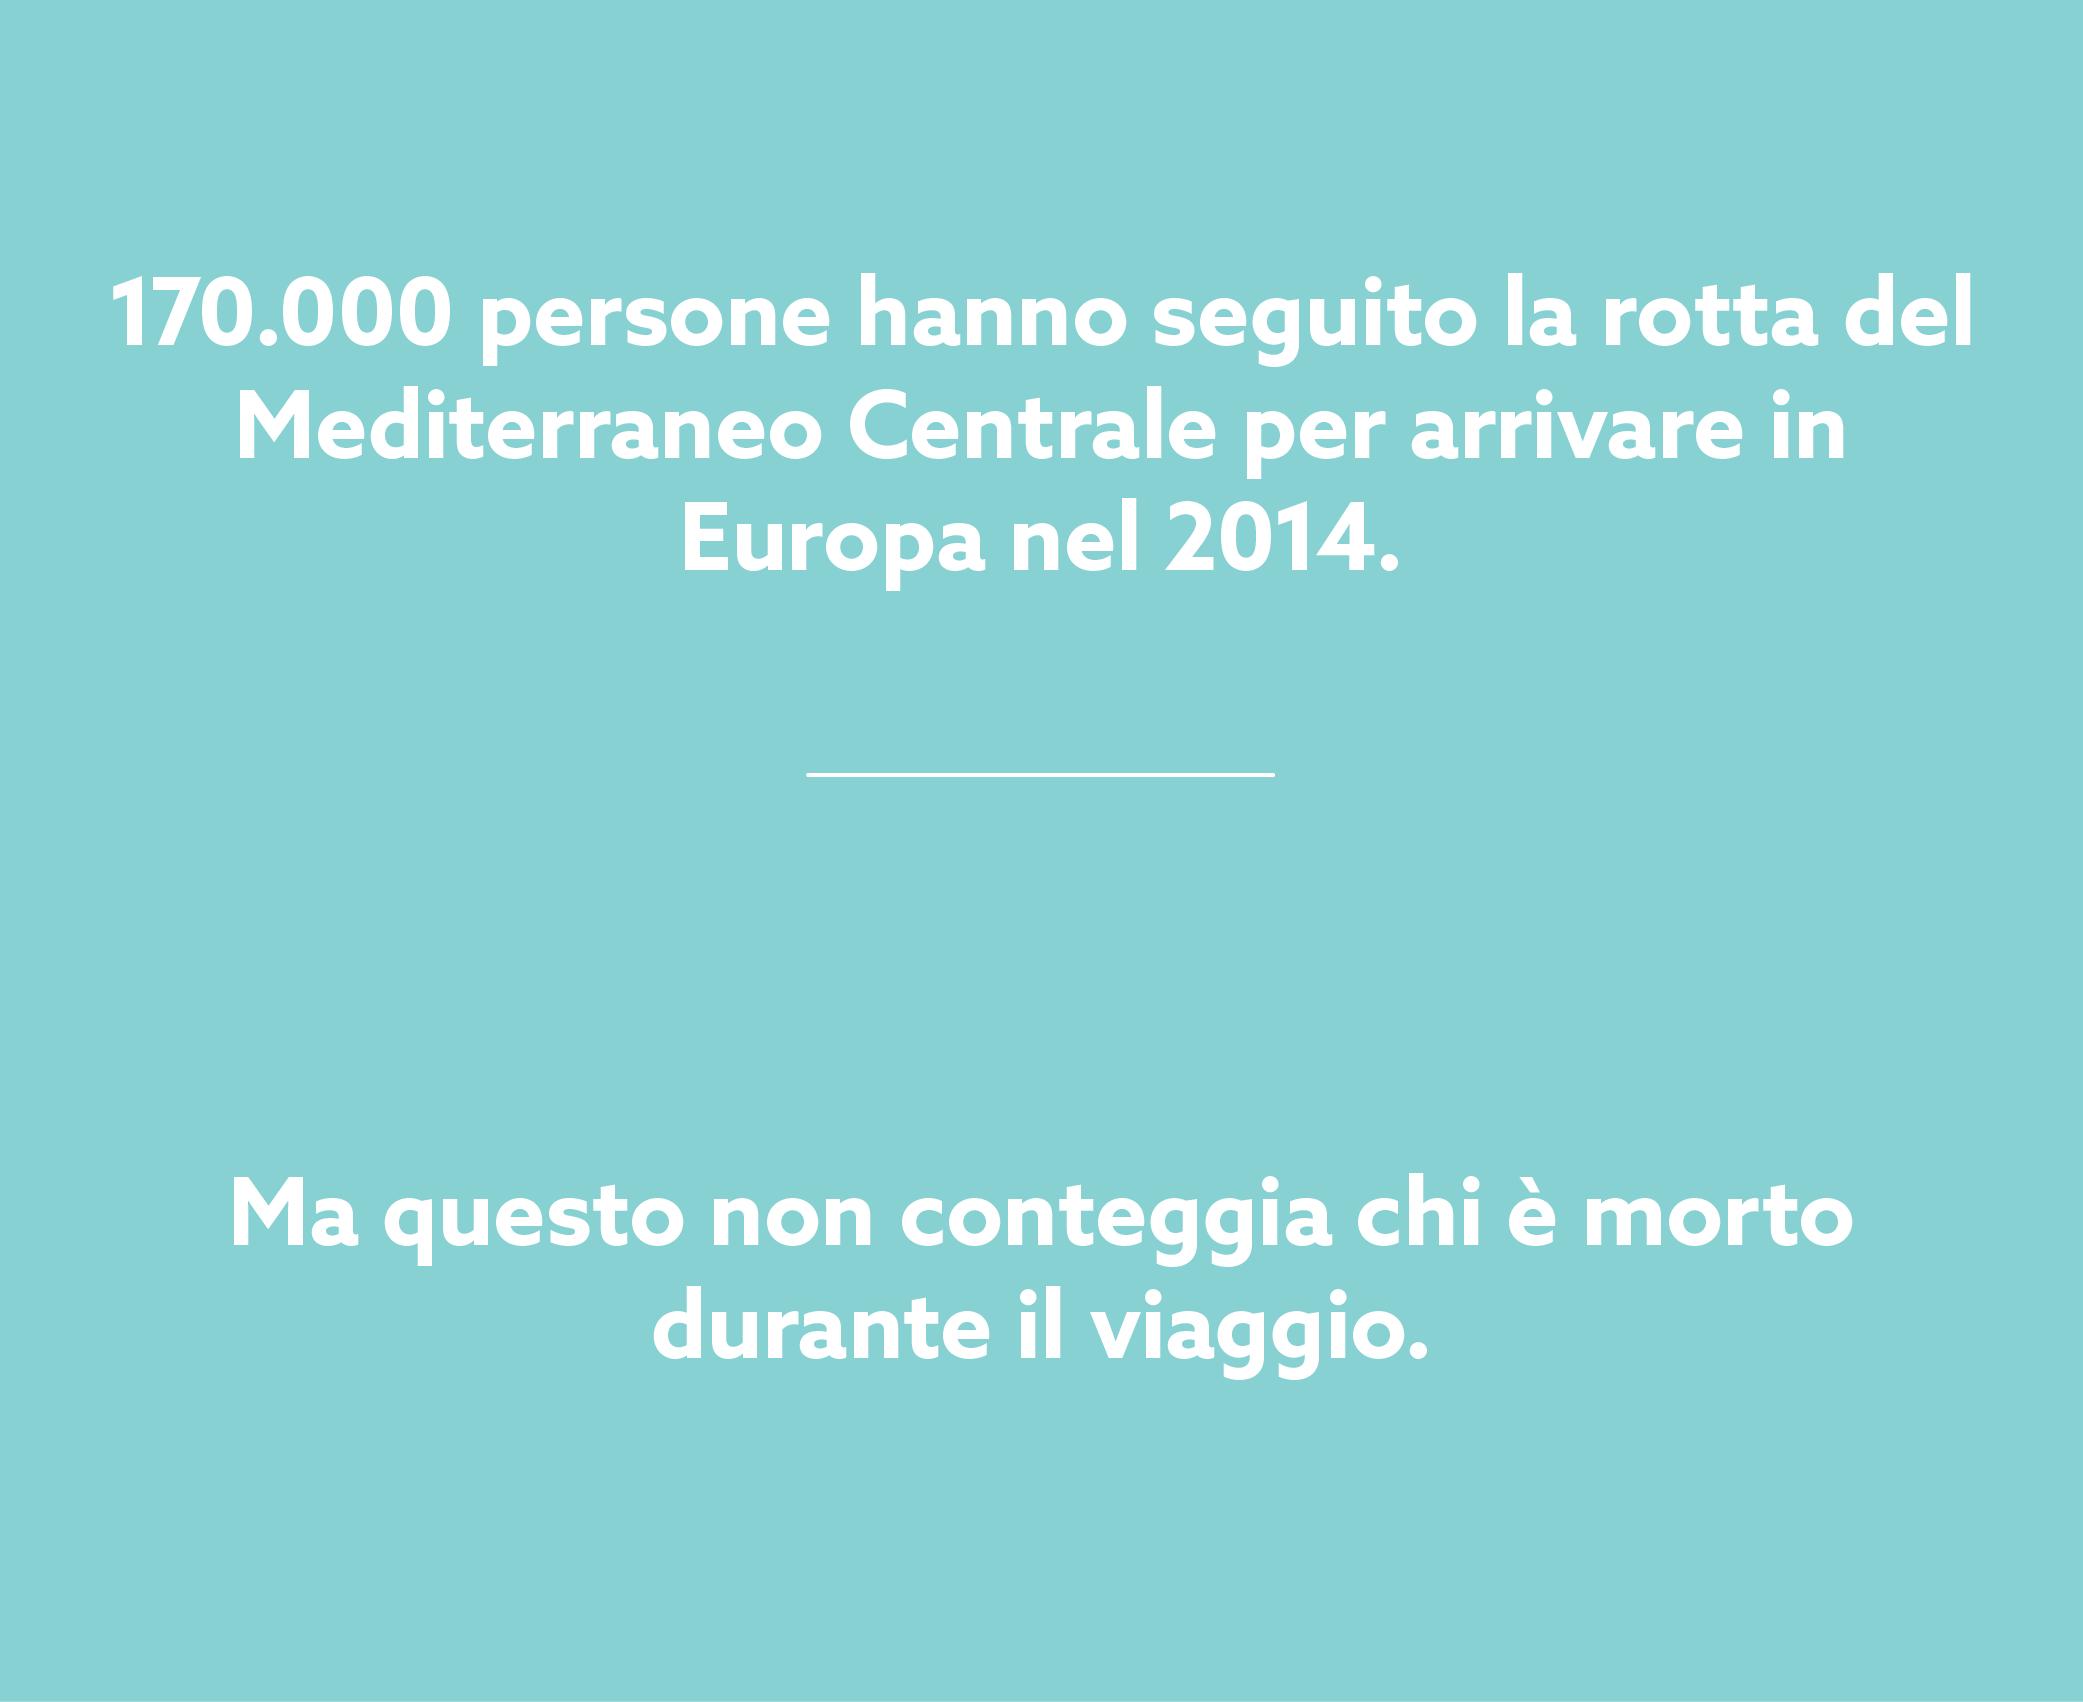 ITALIAN_Migrants_Organized_Part1-03.png